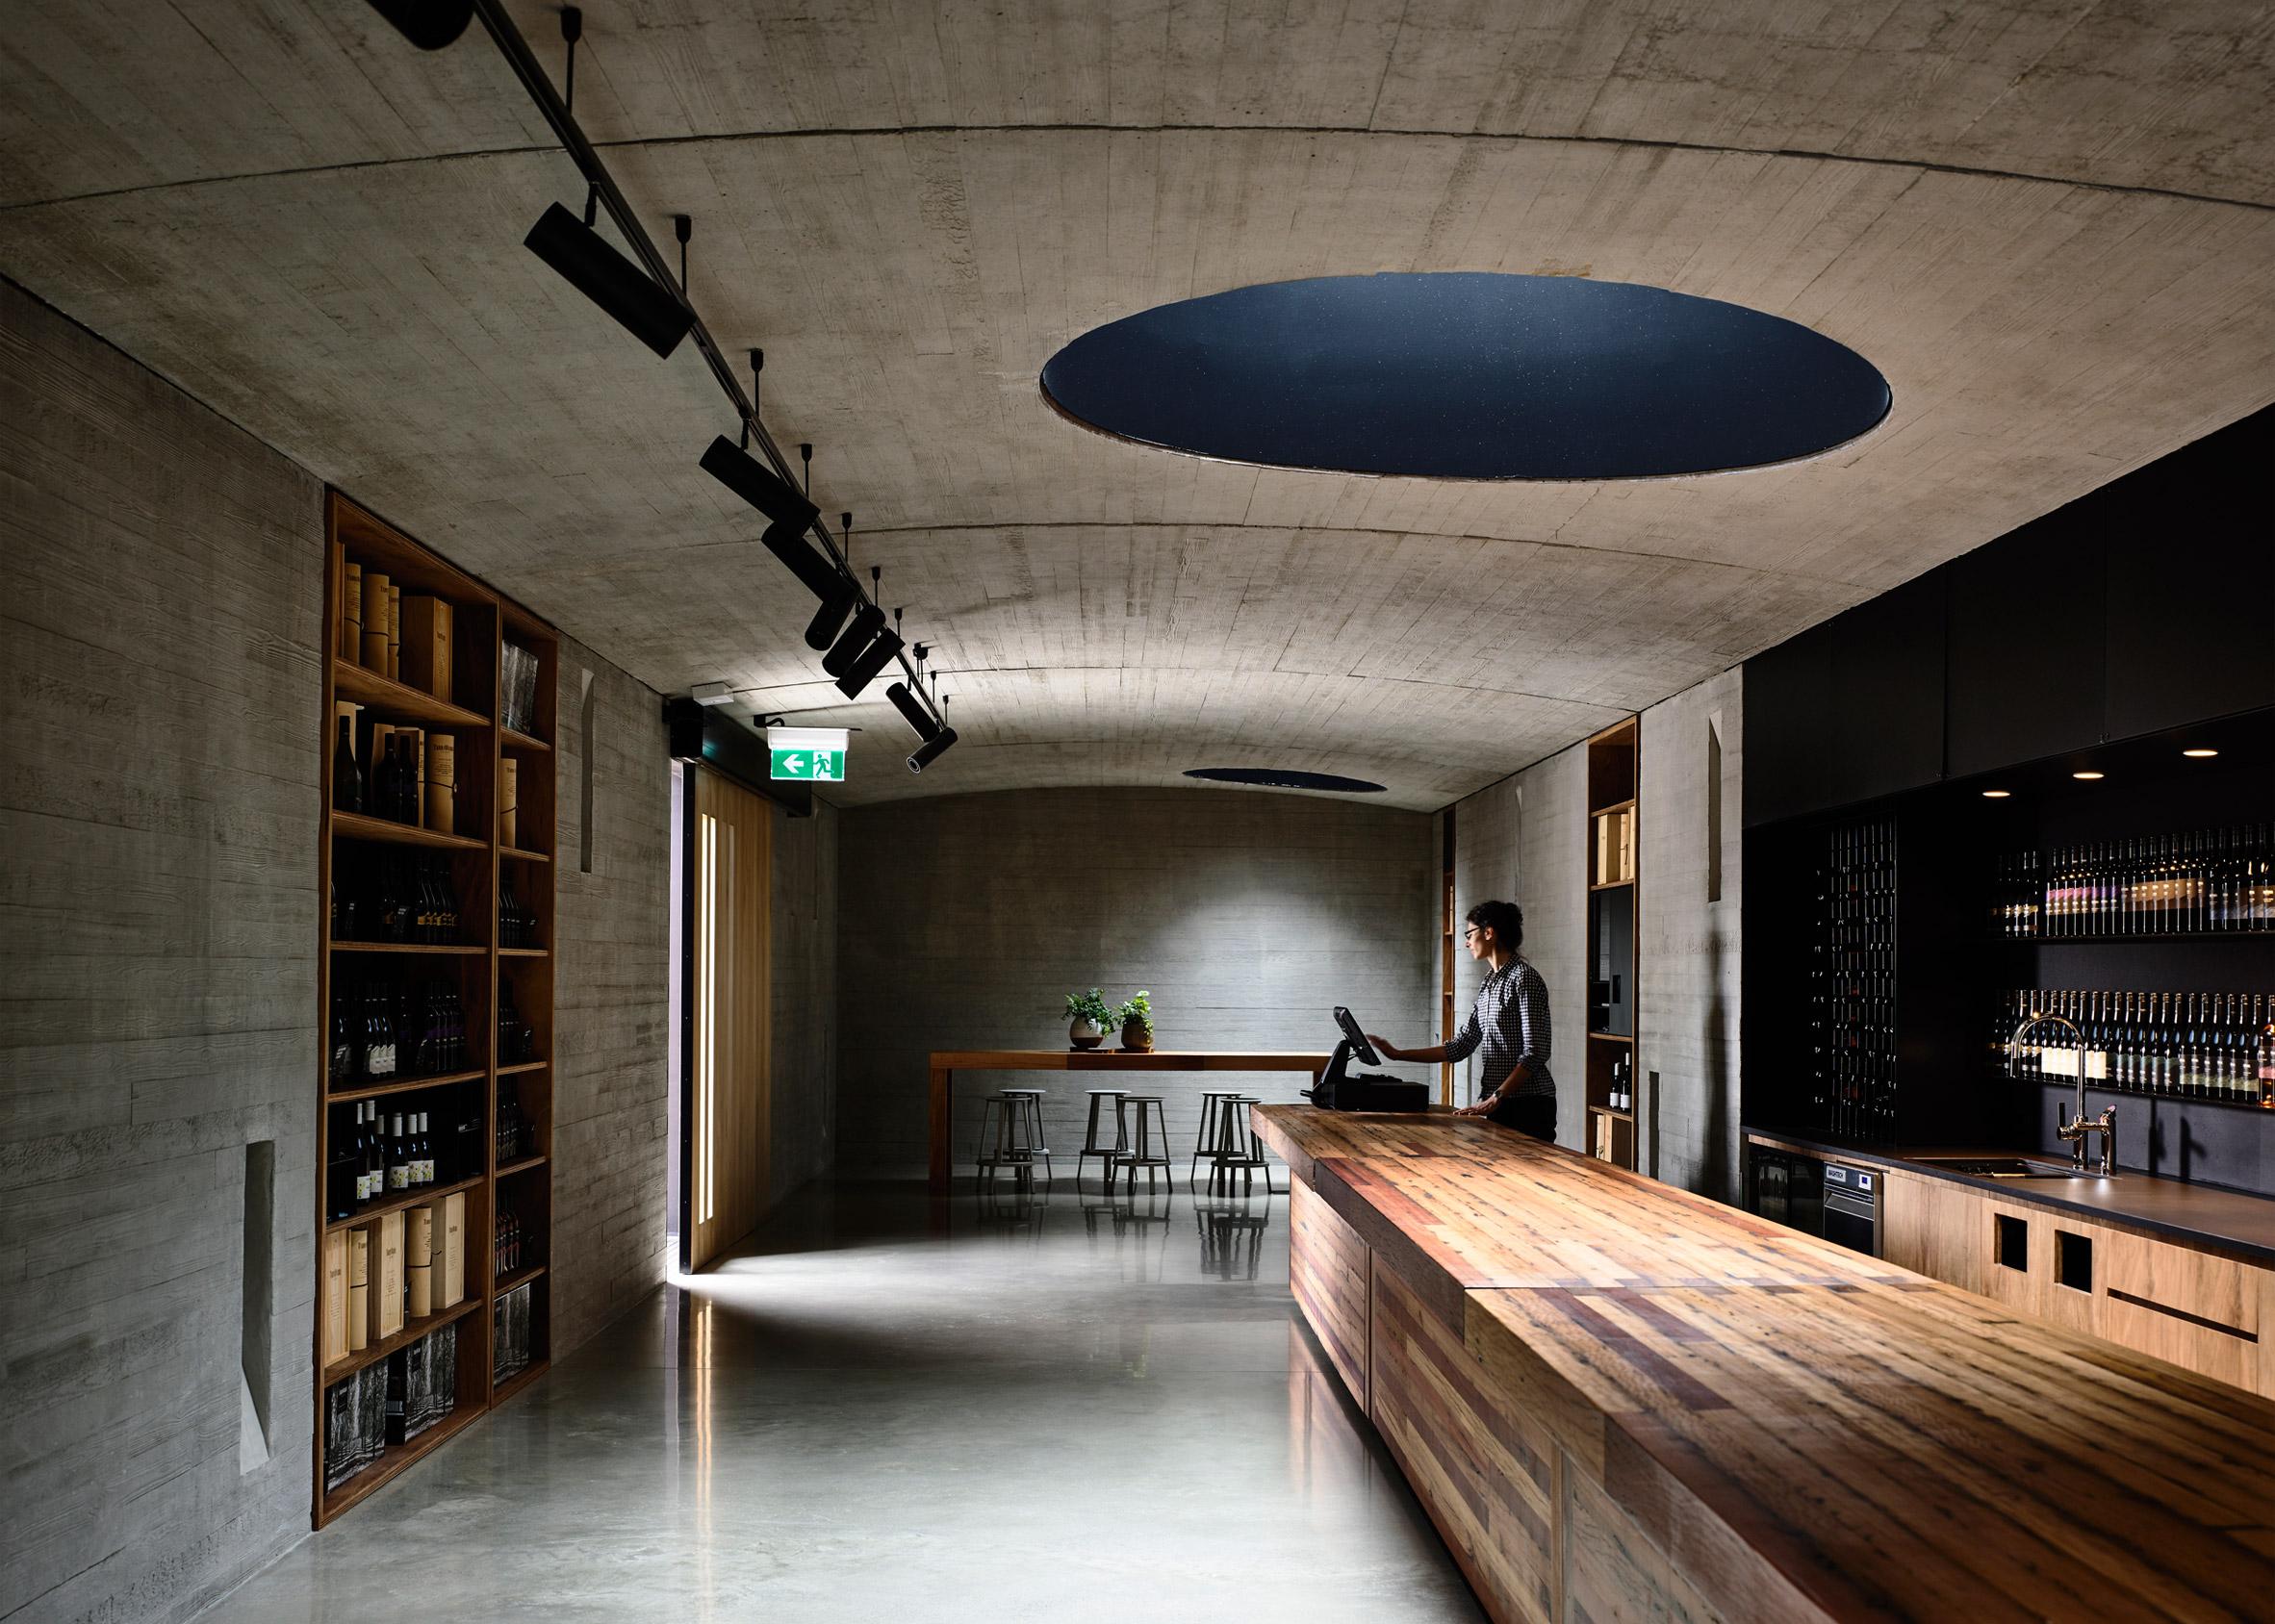 Tarrawarra Cellar Door by Kerstin Thompson Architects (Photography by Derek Swalwell)